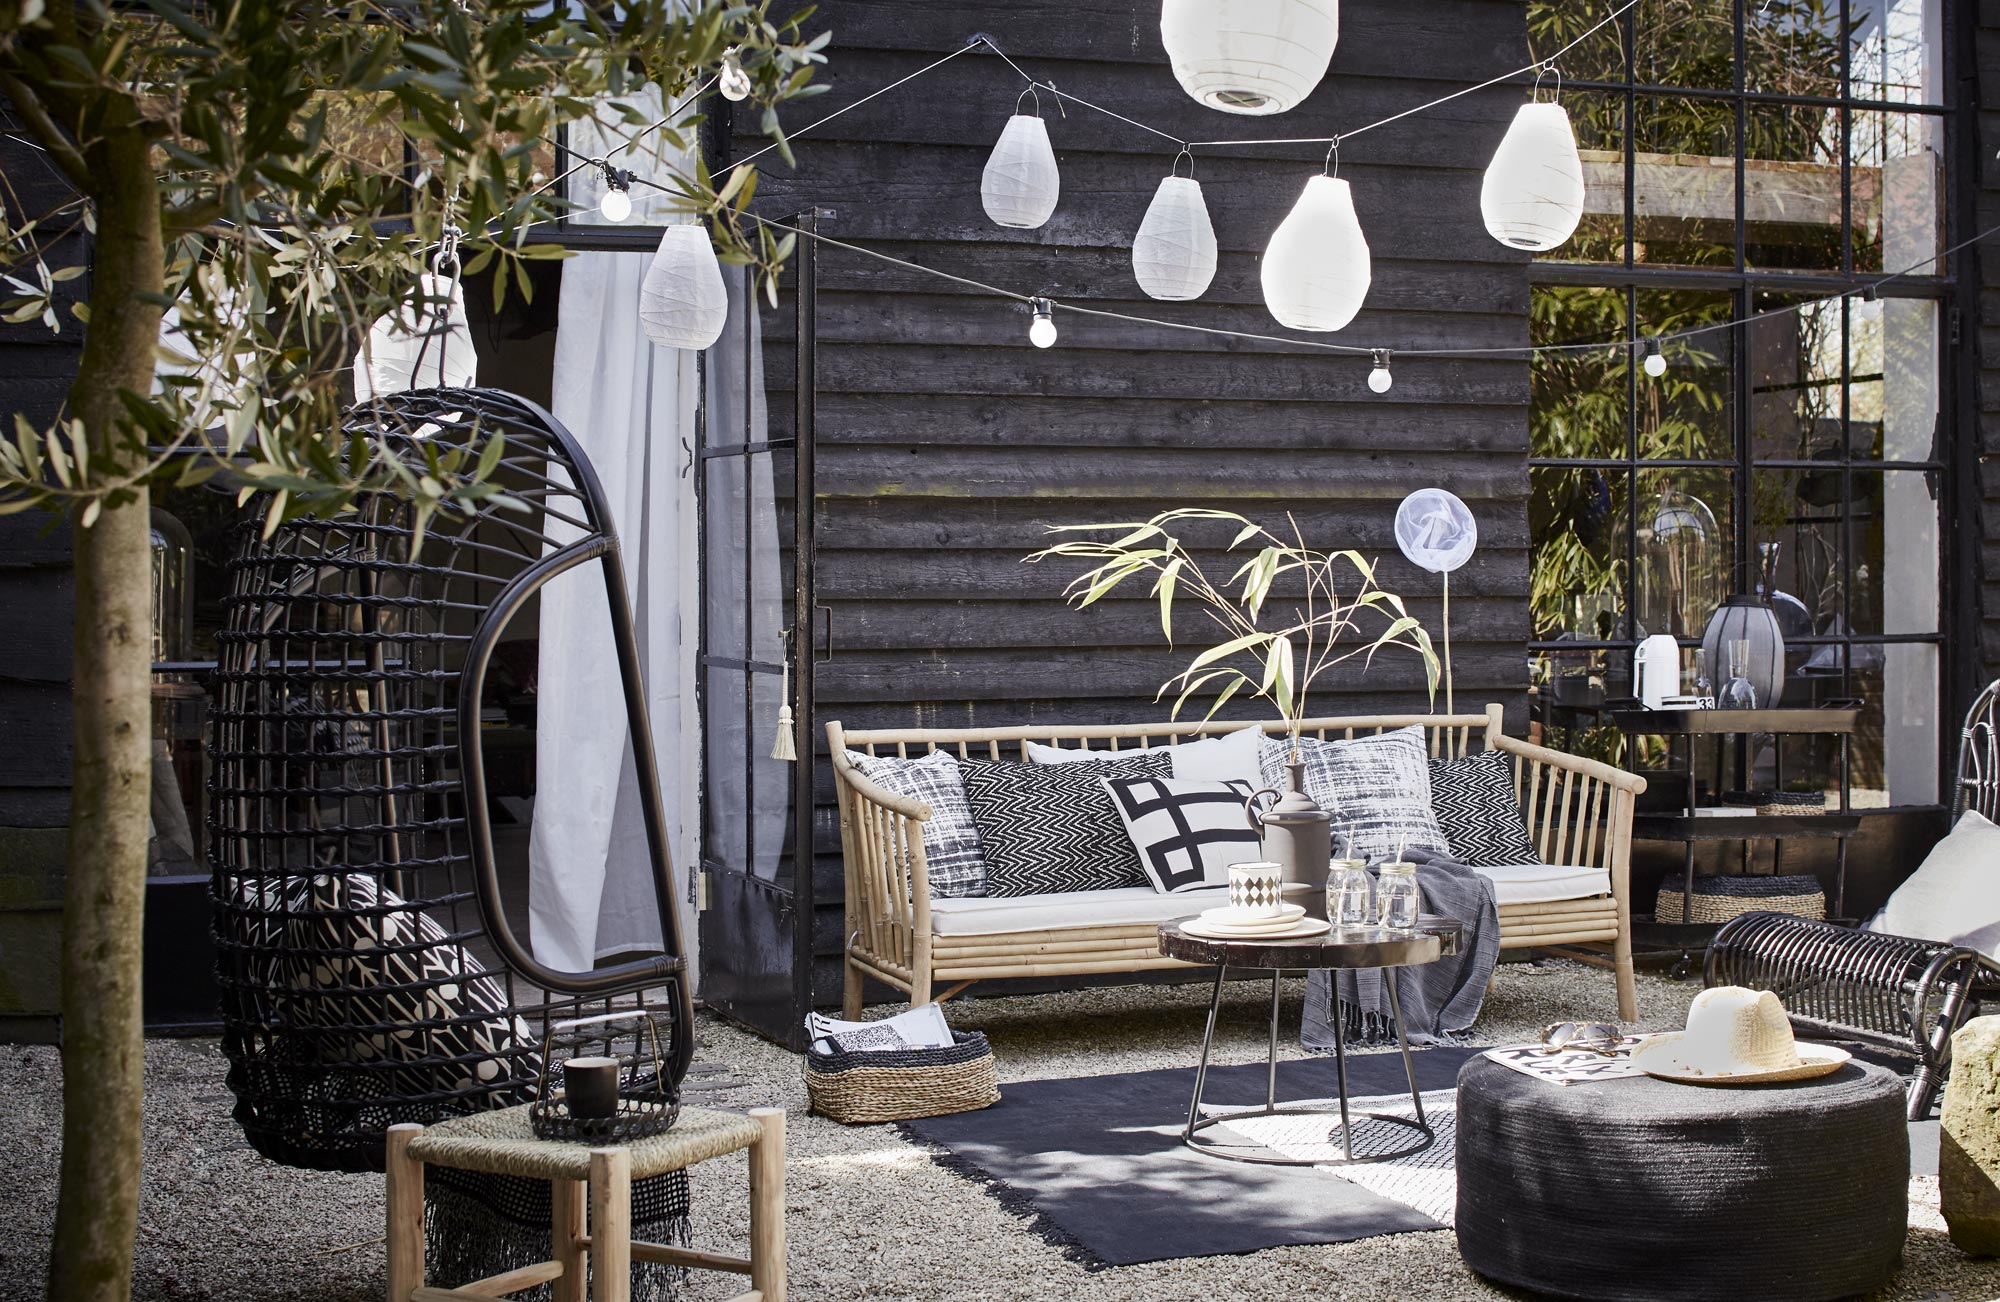 De gezellige vtwonen tuin homease - Idee terras ...